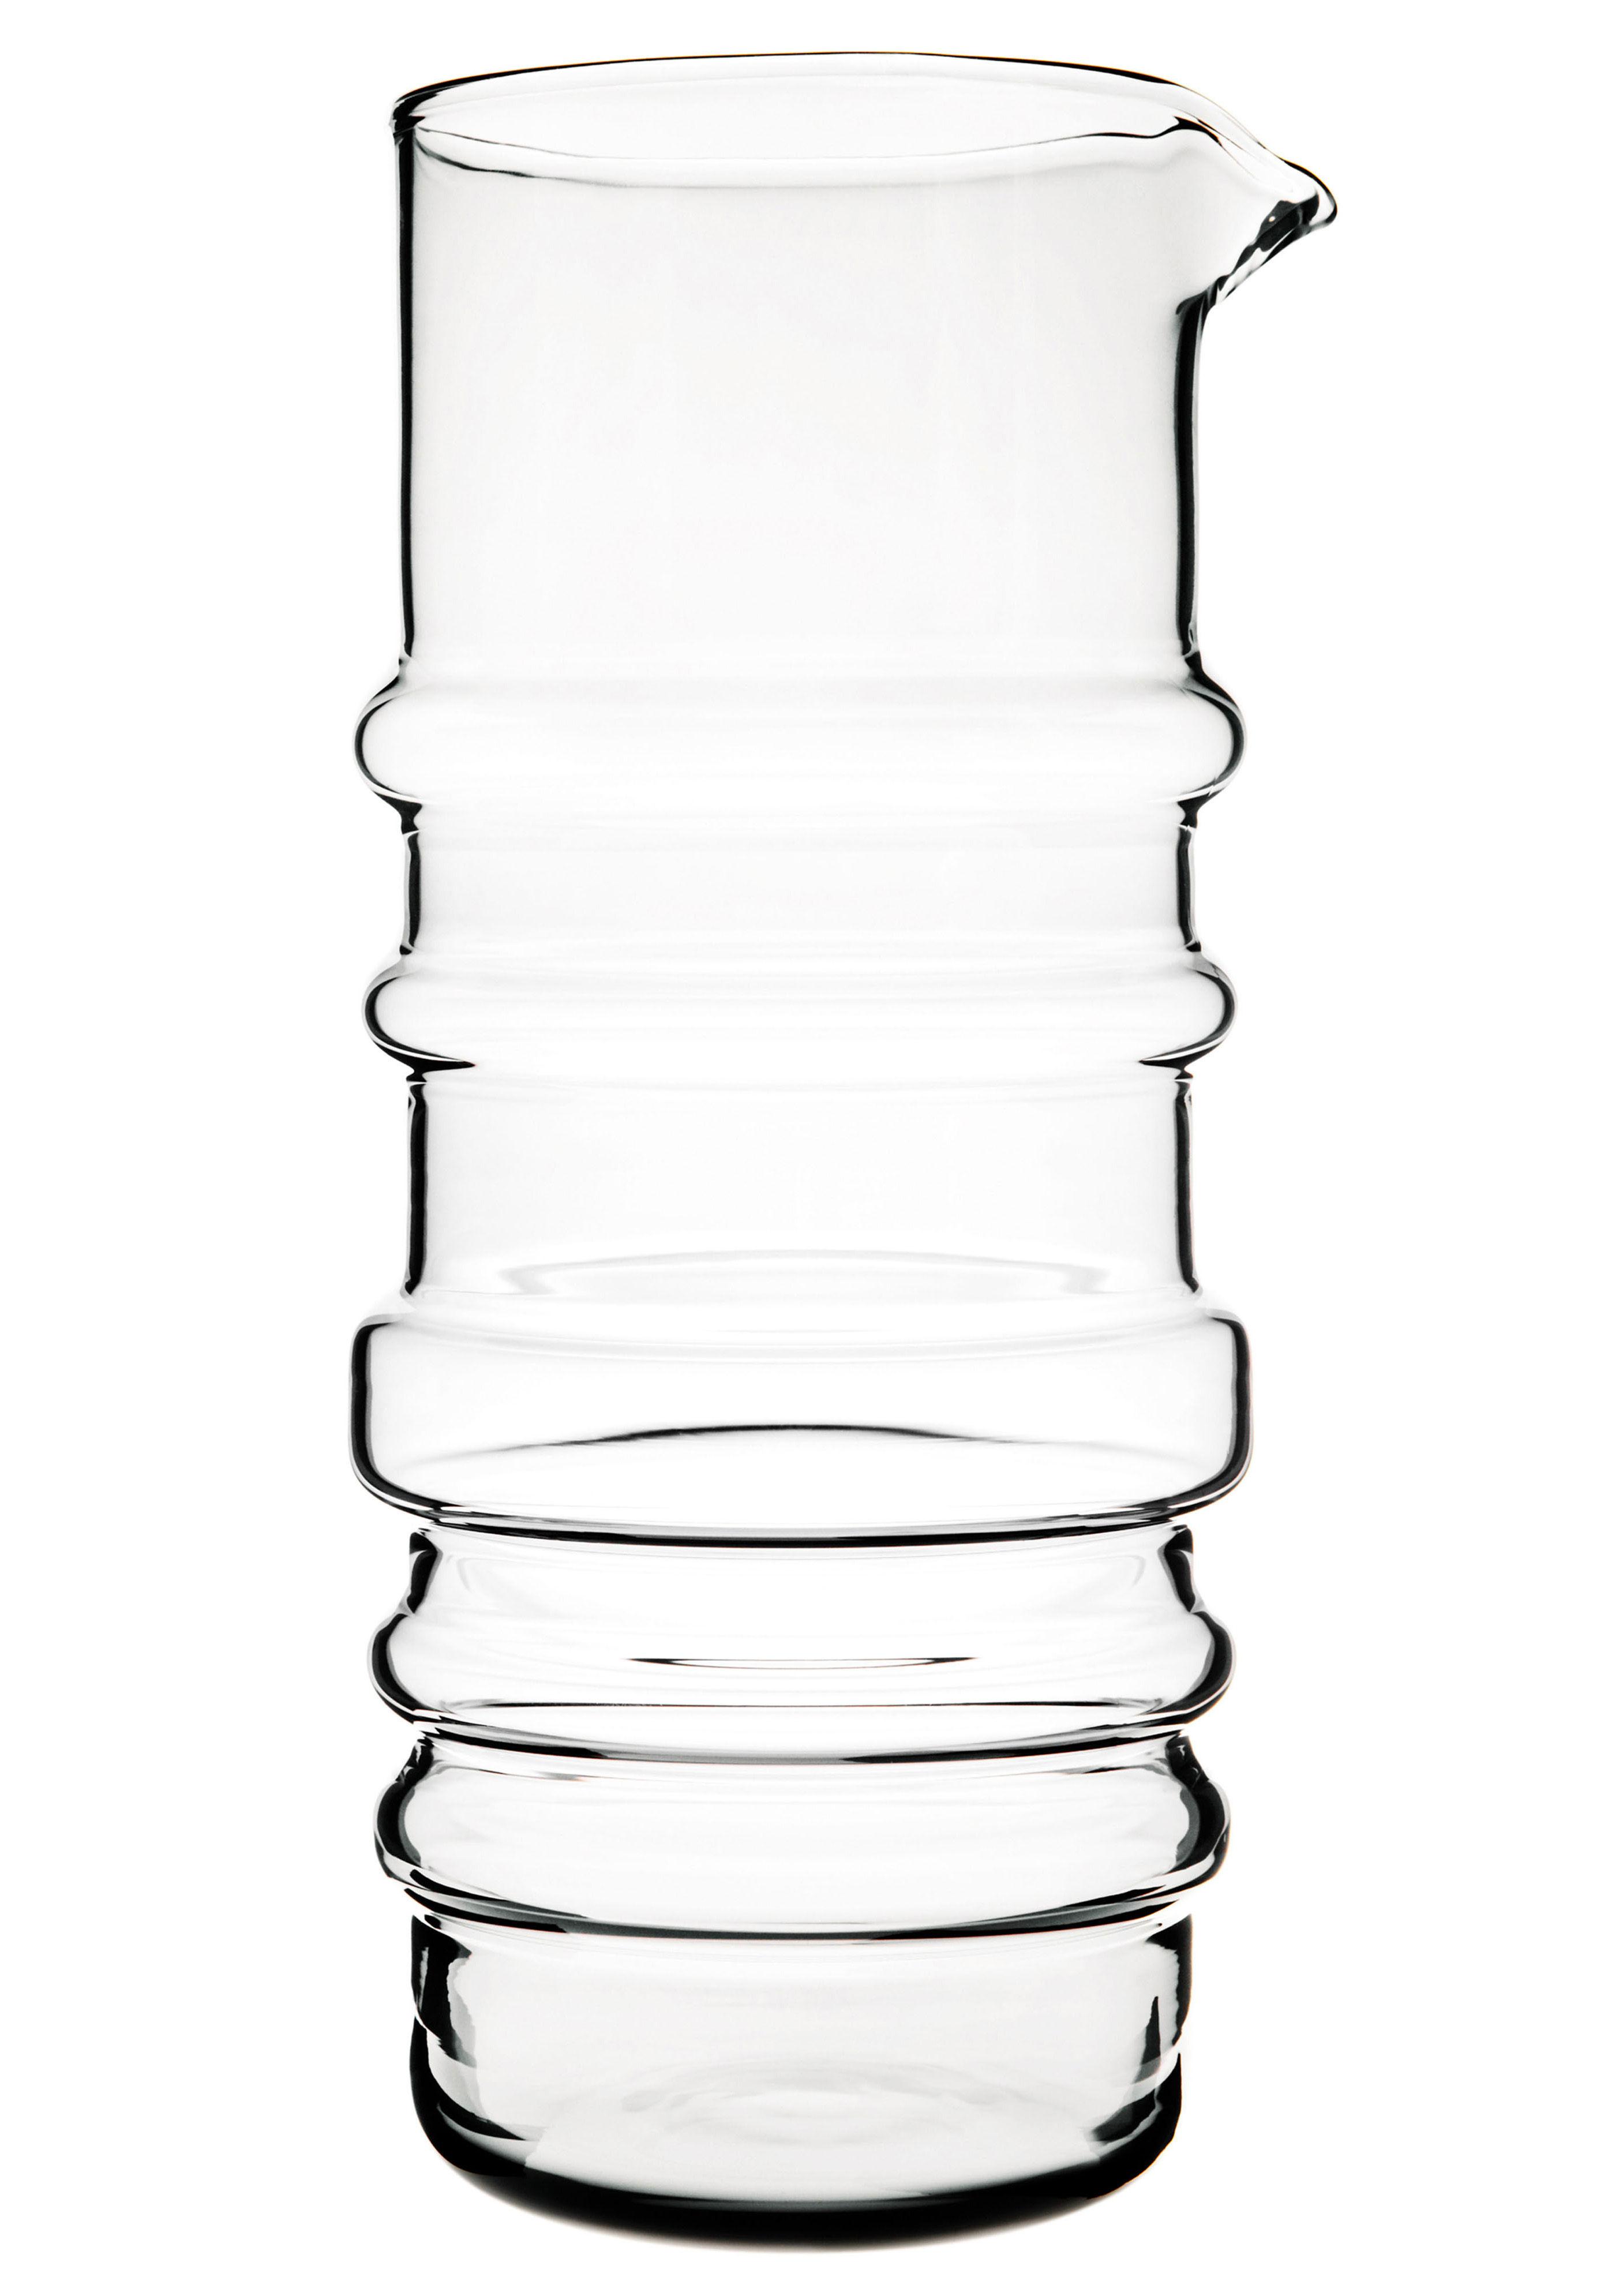 Tischkultur - Karaffen - Sukat Makkaralla Karaffe - Marimekko - Sukat Makkaralla - Transparent - mundgeblasenes Glas